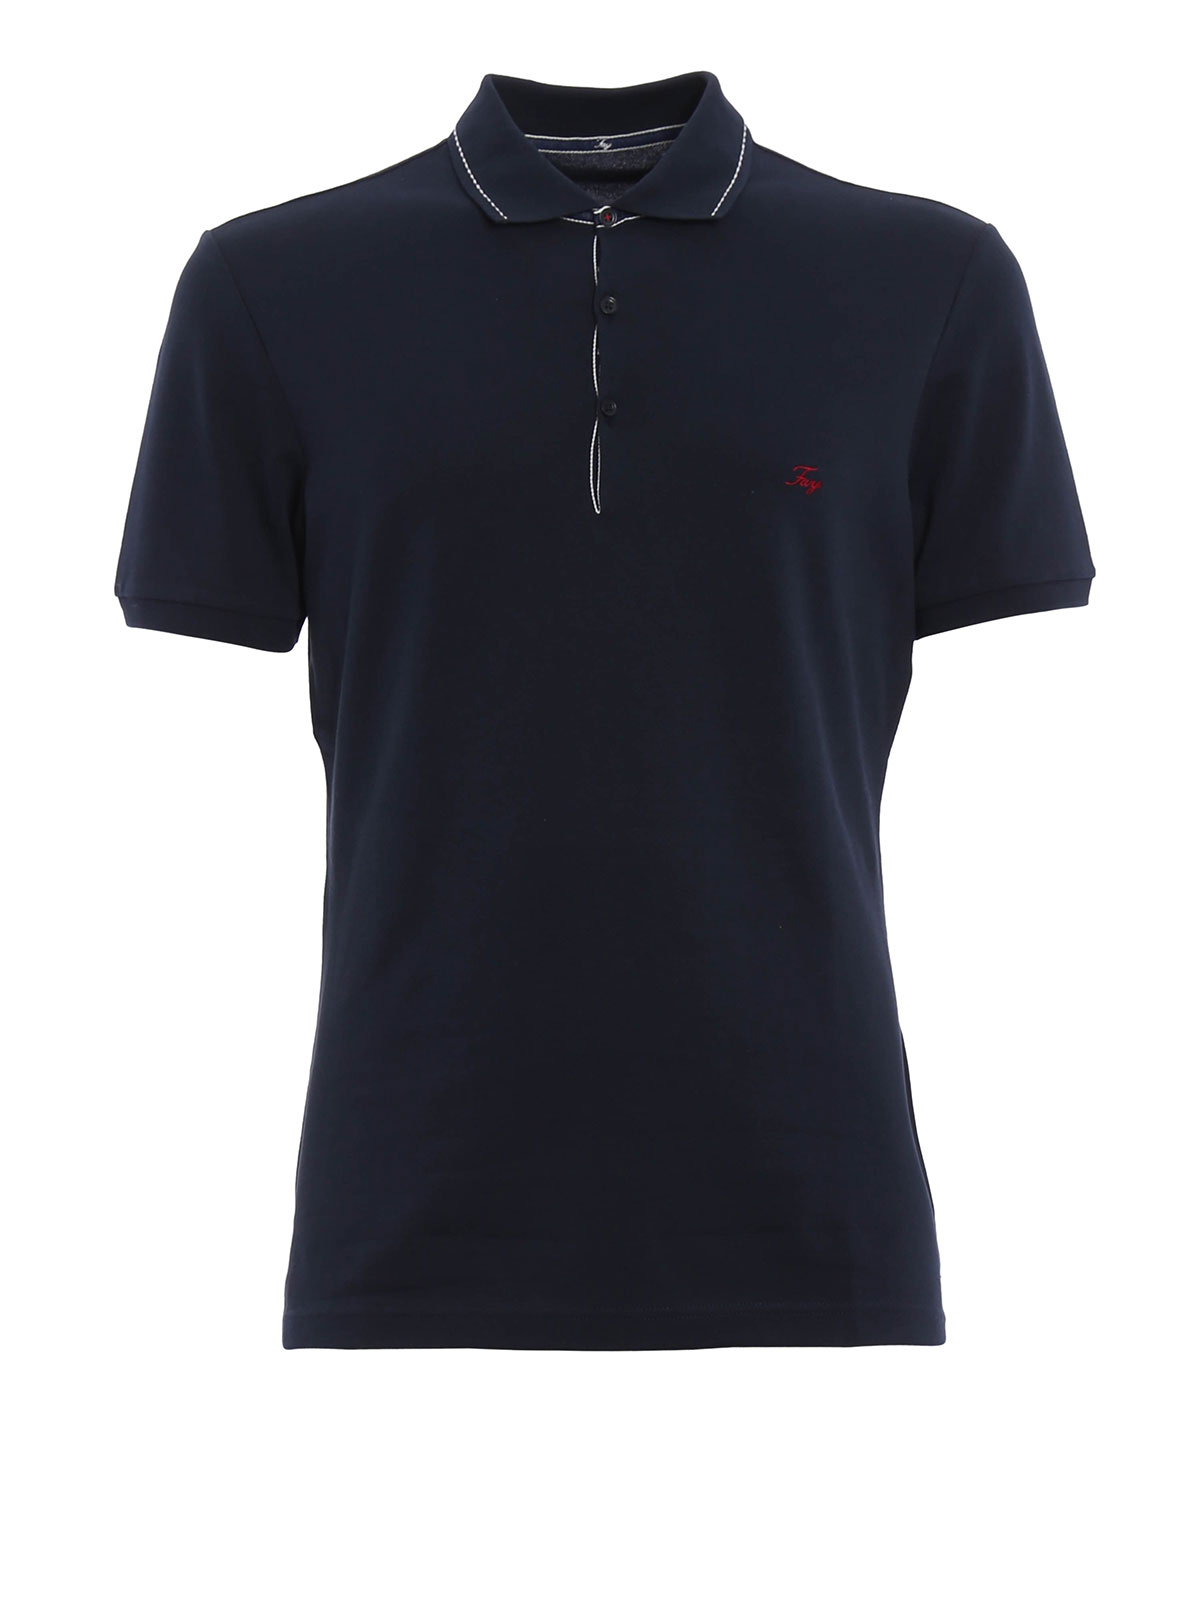 Cotton Pique Polo Shirt By Fay Polo Shirts Ikrix